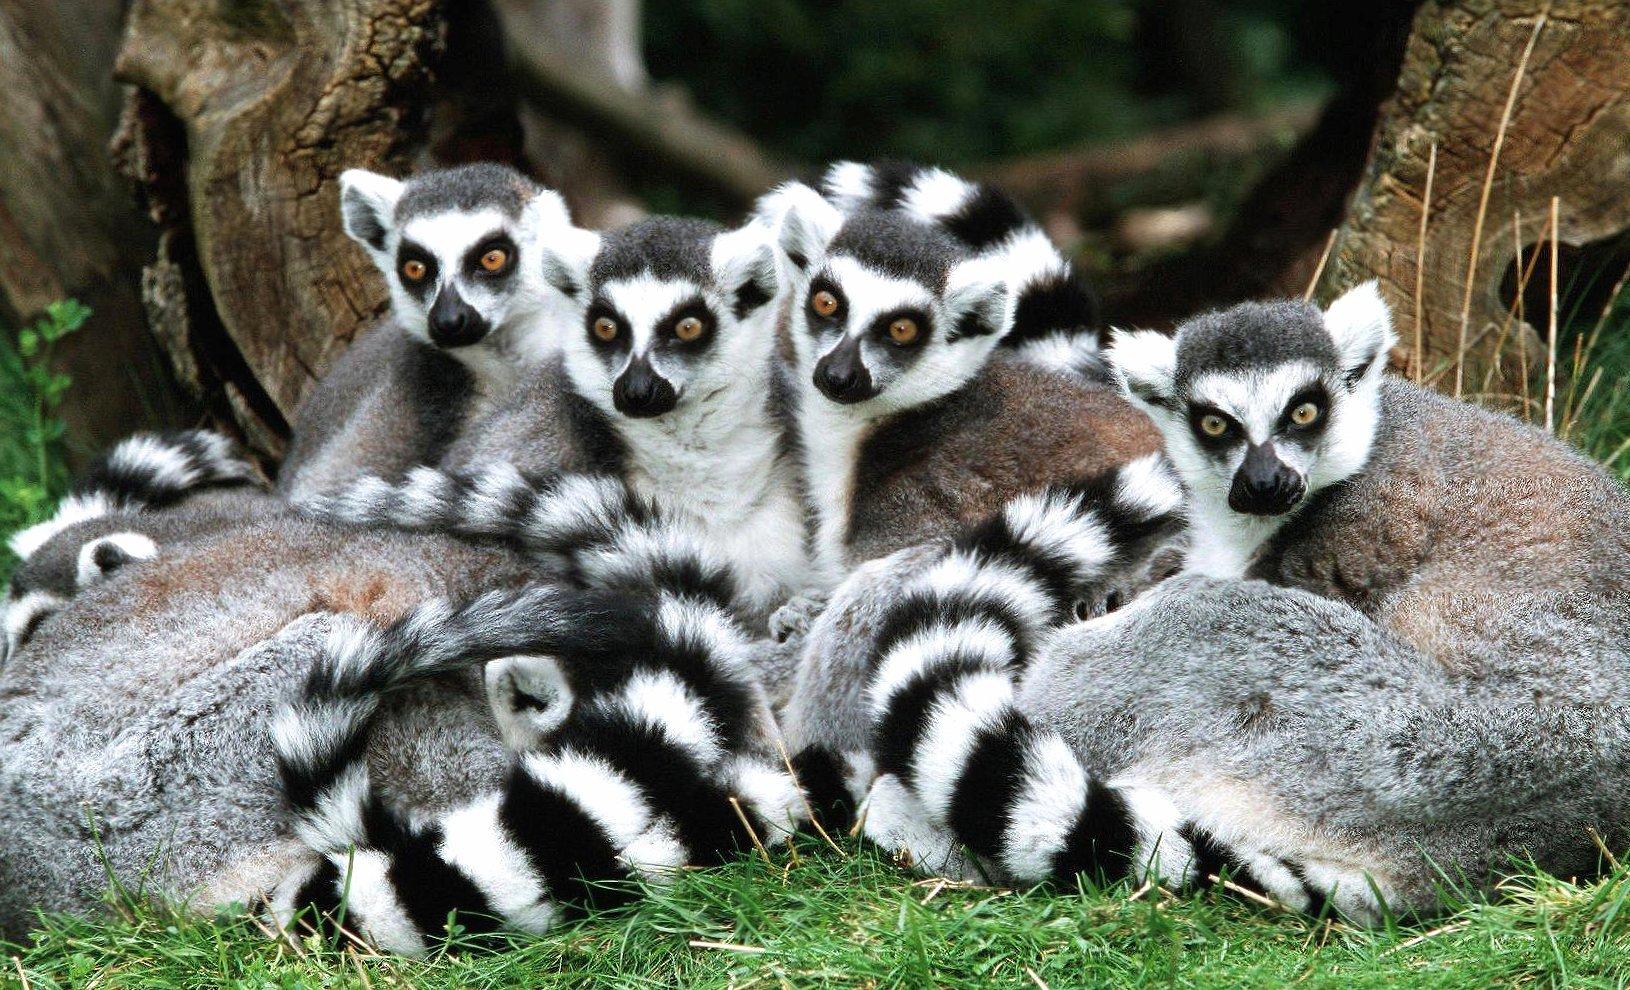 Lemurs faminy wallpapers HD quality